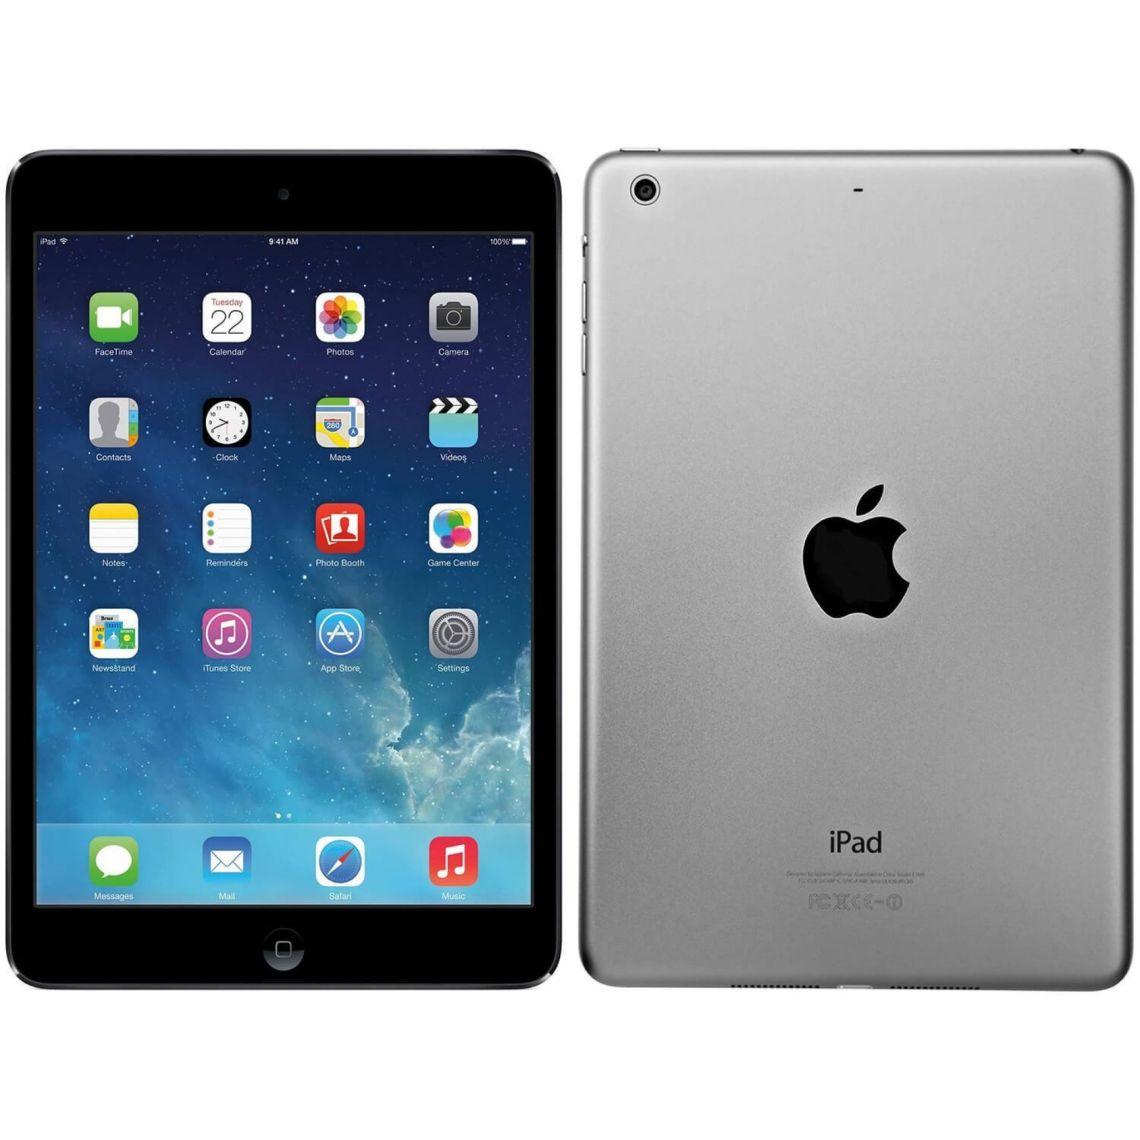 "Refurbished Apple iPad Air WiFi 16GB iOS 7 9.7"" Tablet - MD785LL/A - Space Gray - Walmart.com"